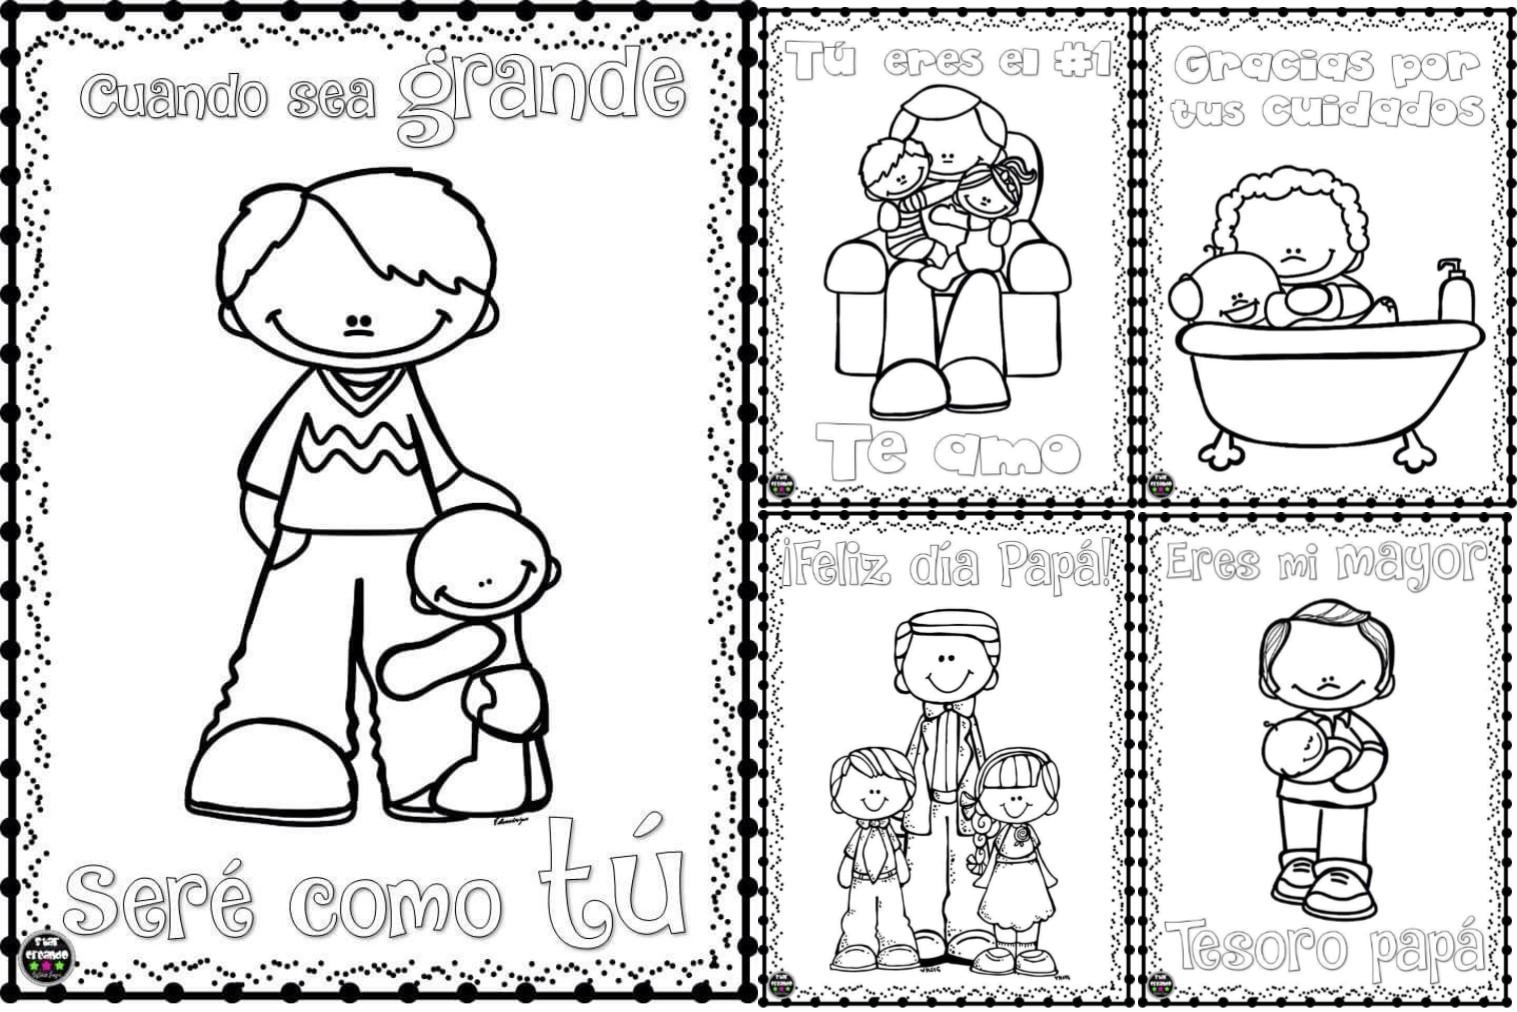 Pdf Dibujos Para Colorear Para El Dia Del Padre Preescolar